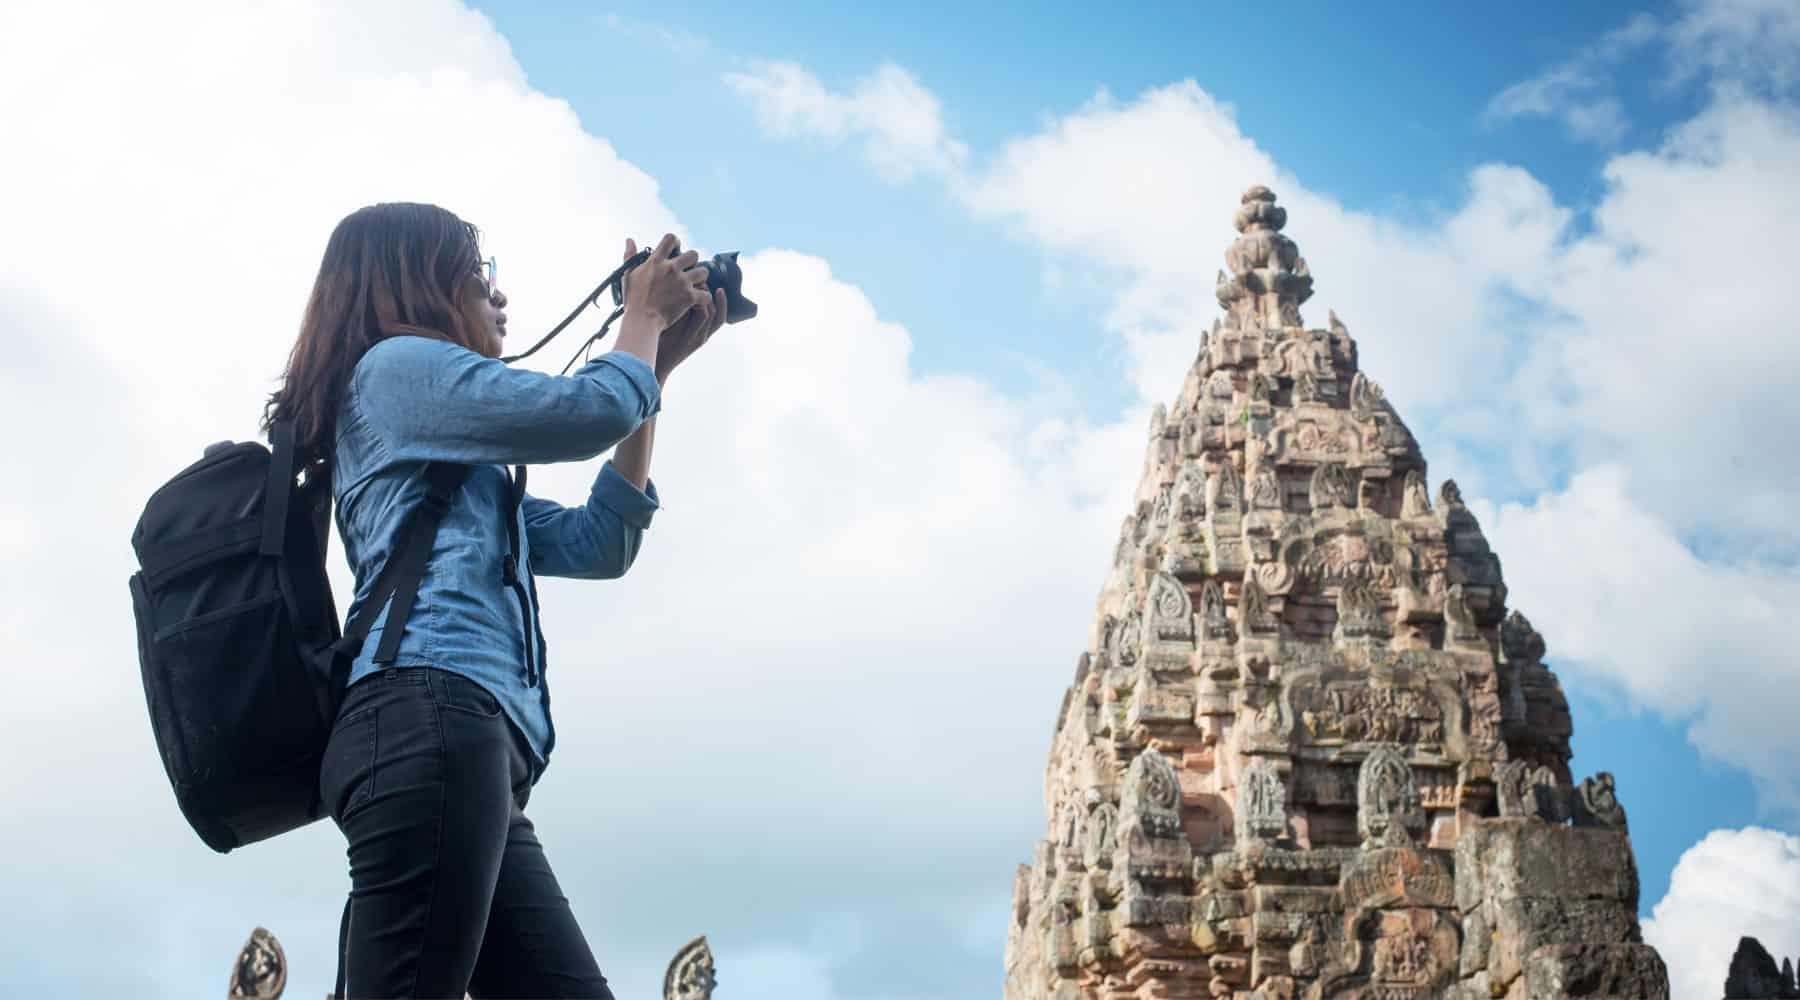 Phanom Rung Historical Park, Thailand- Full Guide